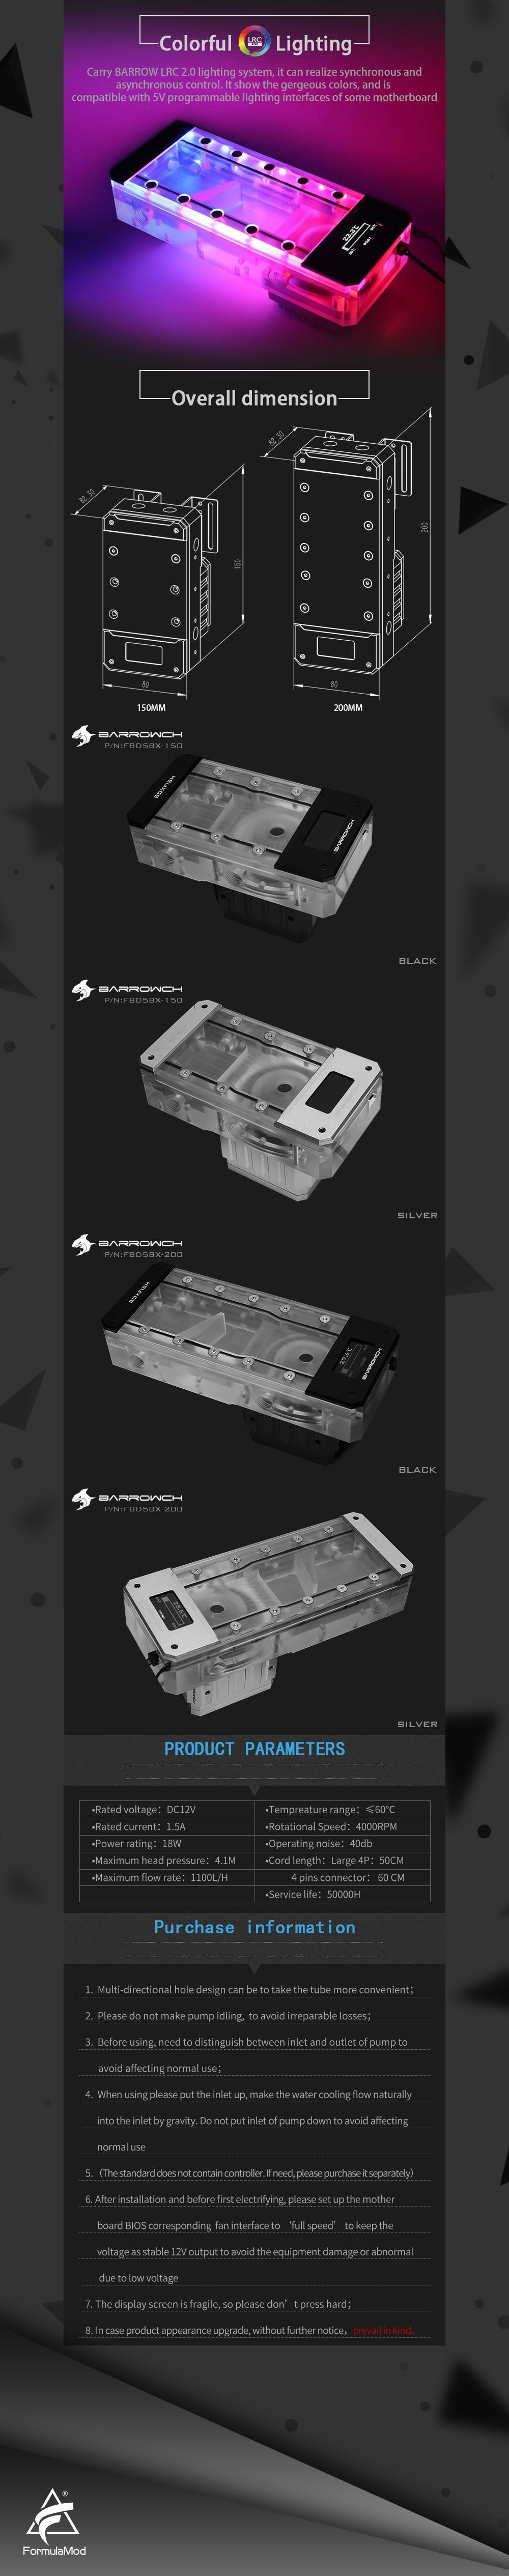 Barrowch FBD5BX, Digital Display PWM 18W Pump With Reservoir Combinations, Box Fish D5 Series, Integrated Pump + Reservoir,